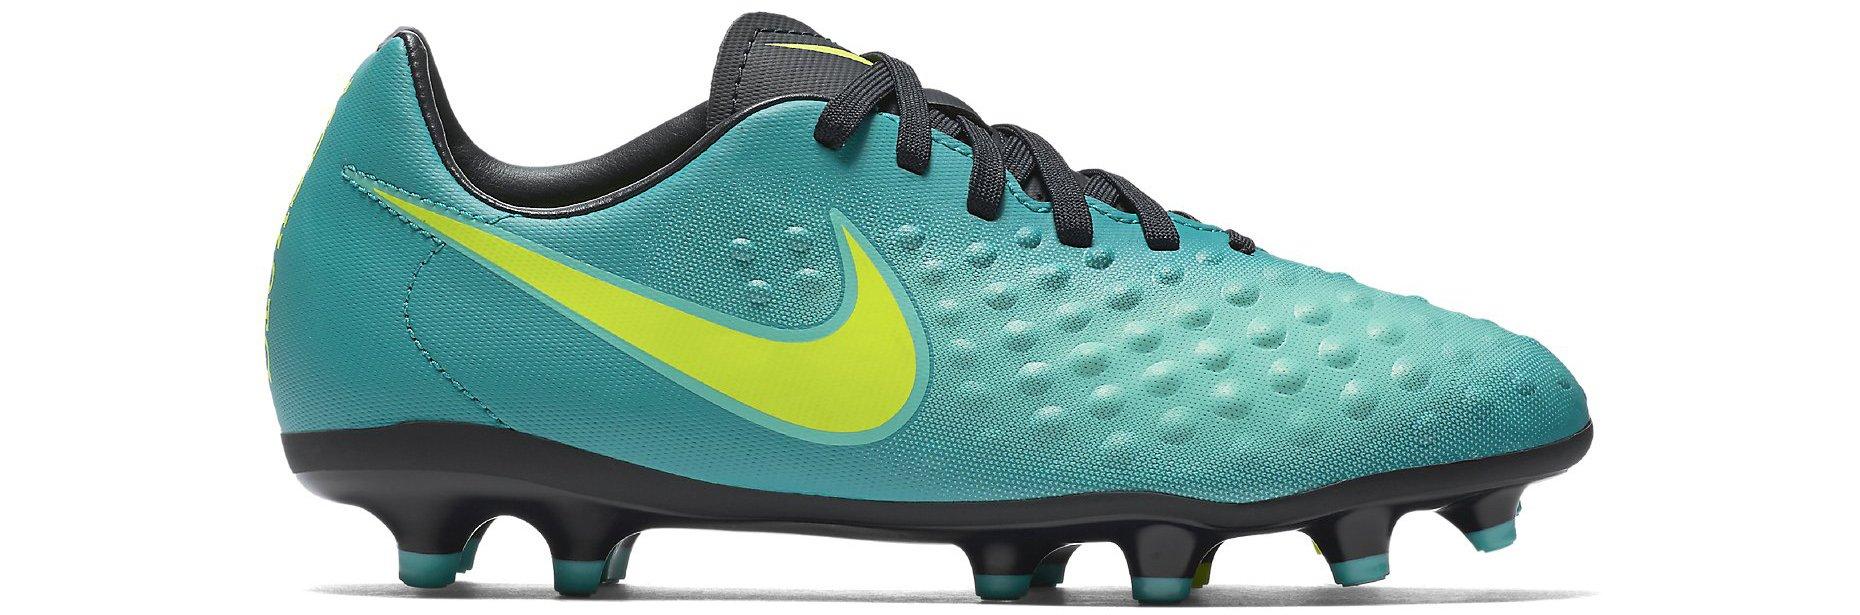 Kopačky Nike Magista Opus II FG